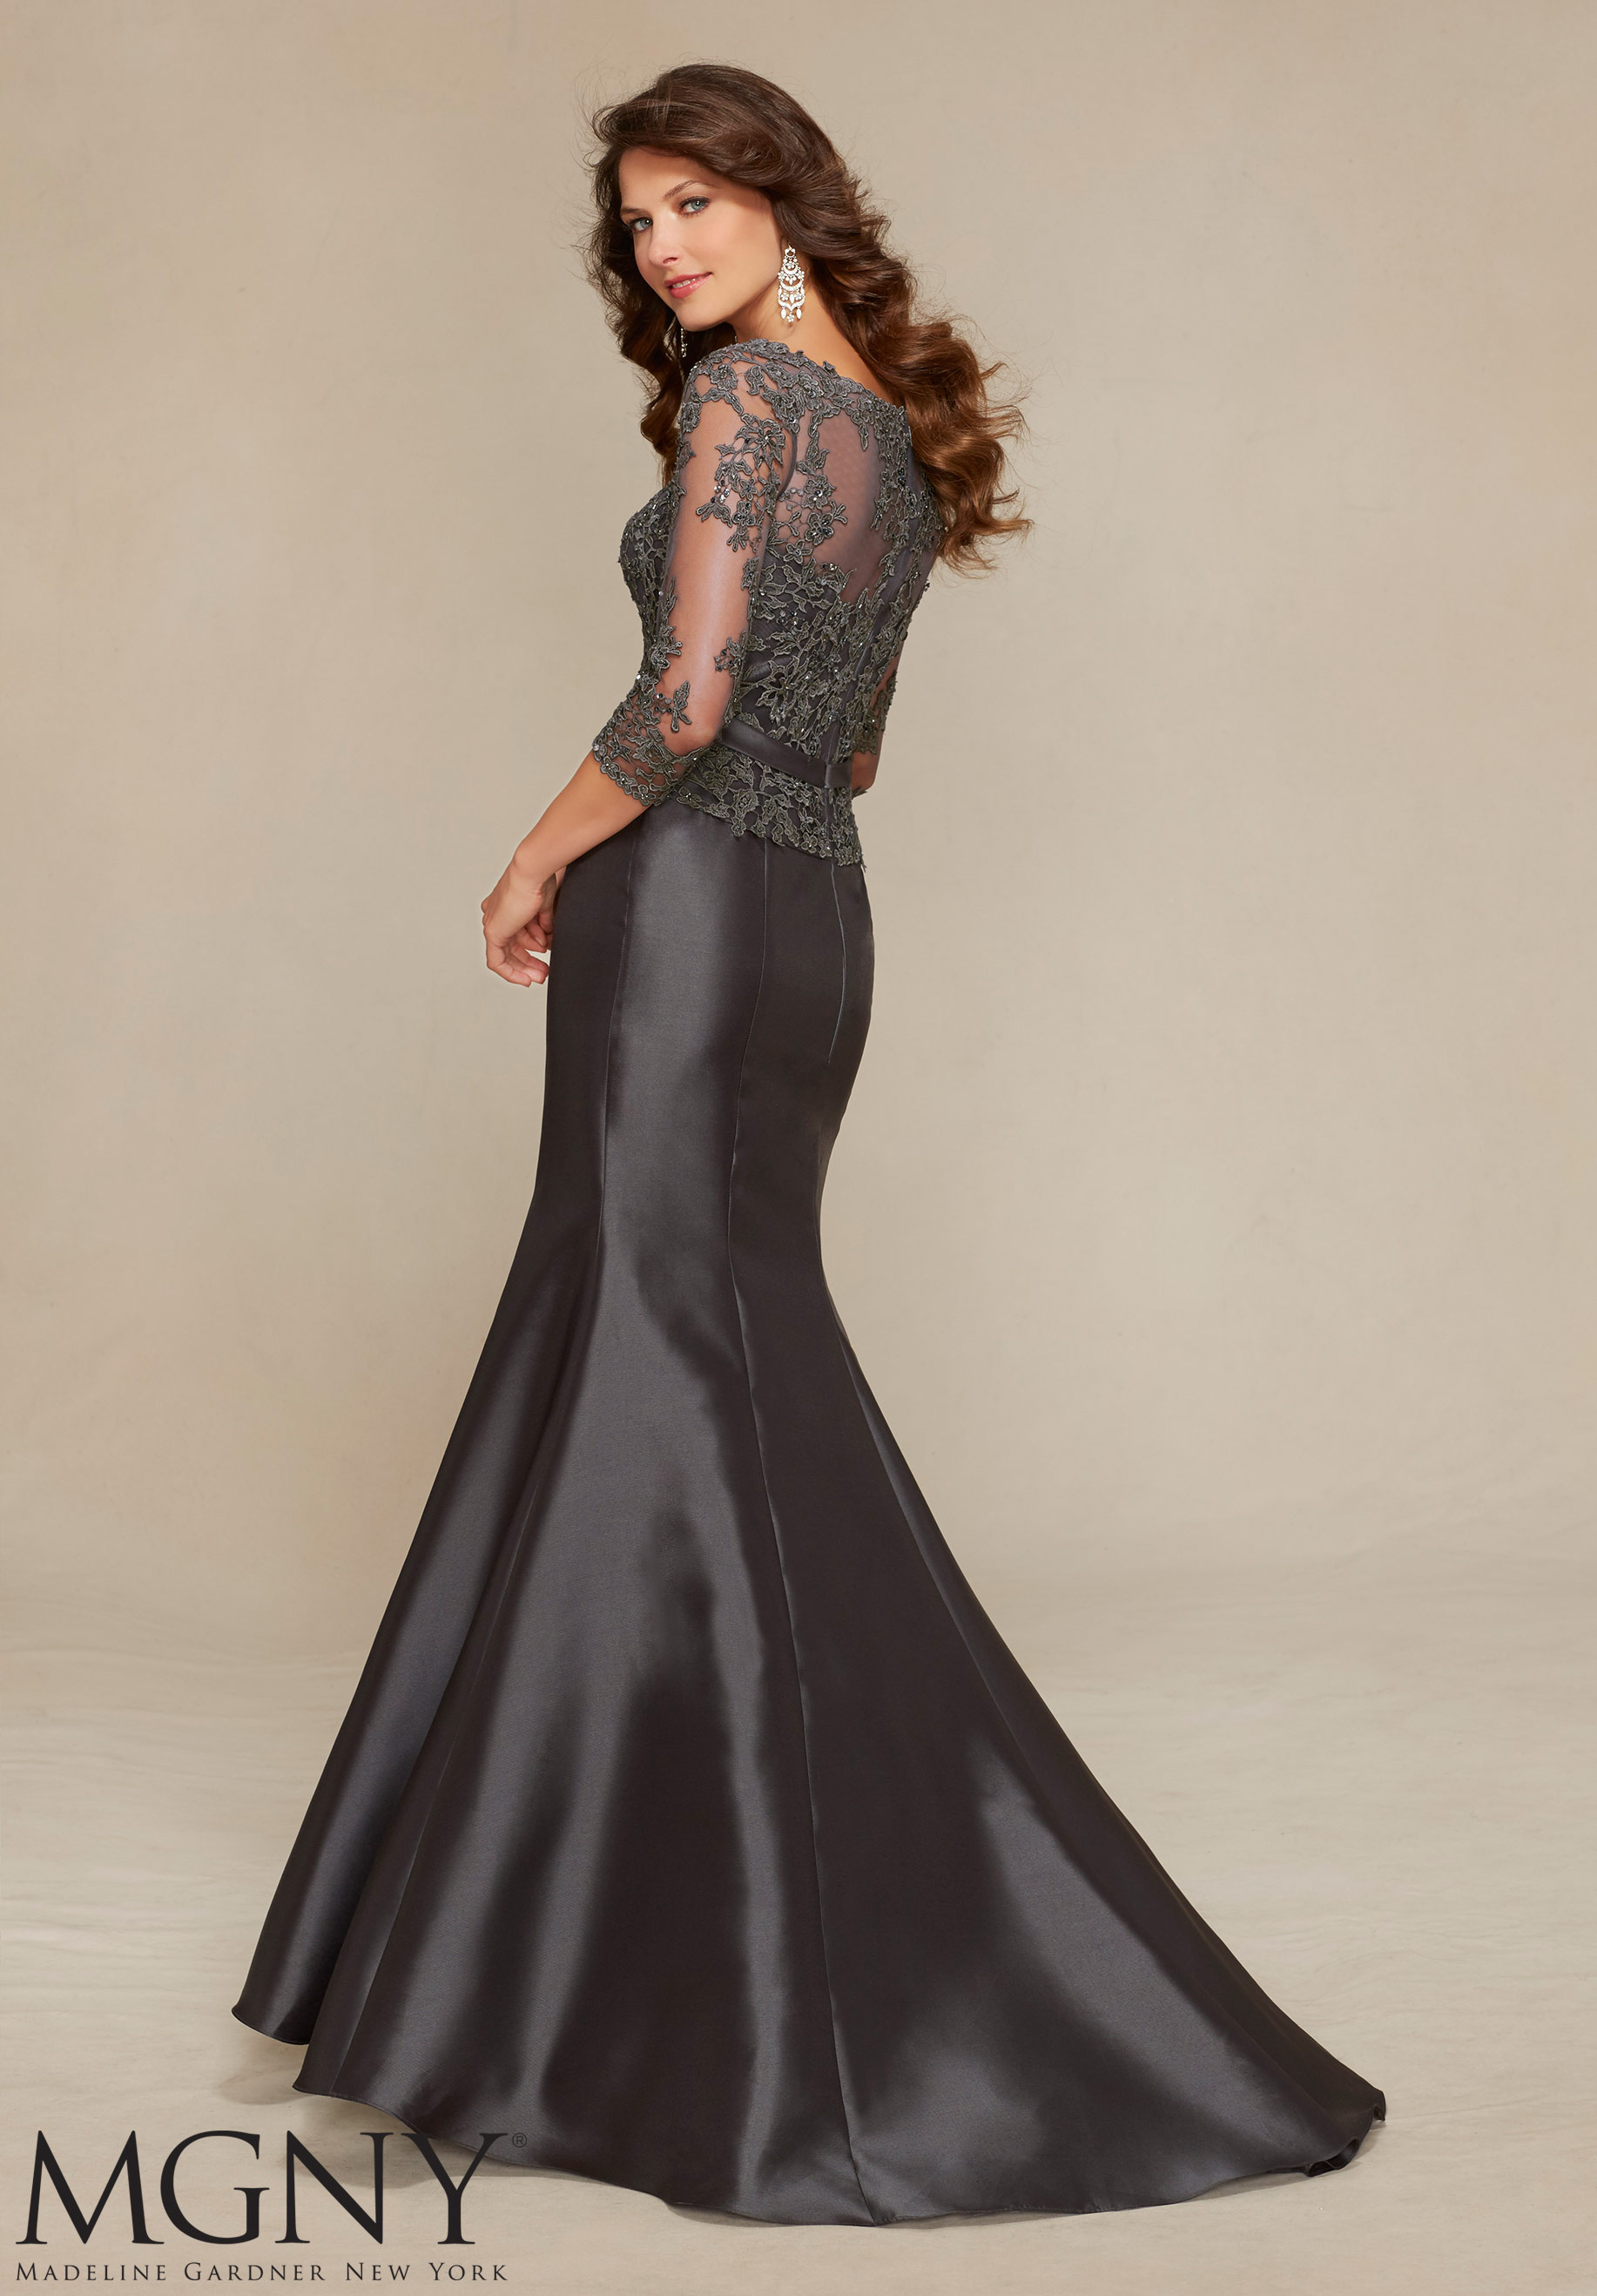 amazon black evening dresses photo - 1